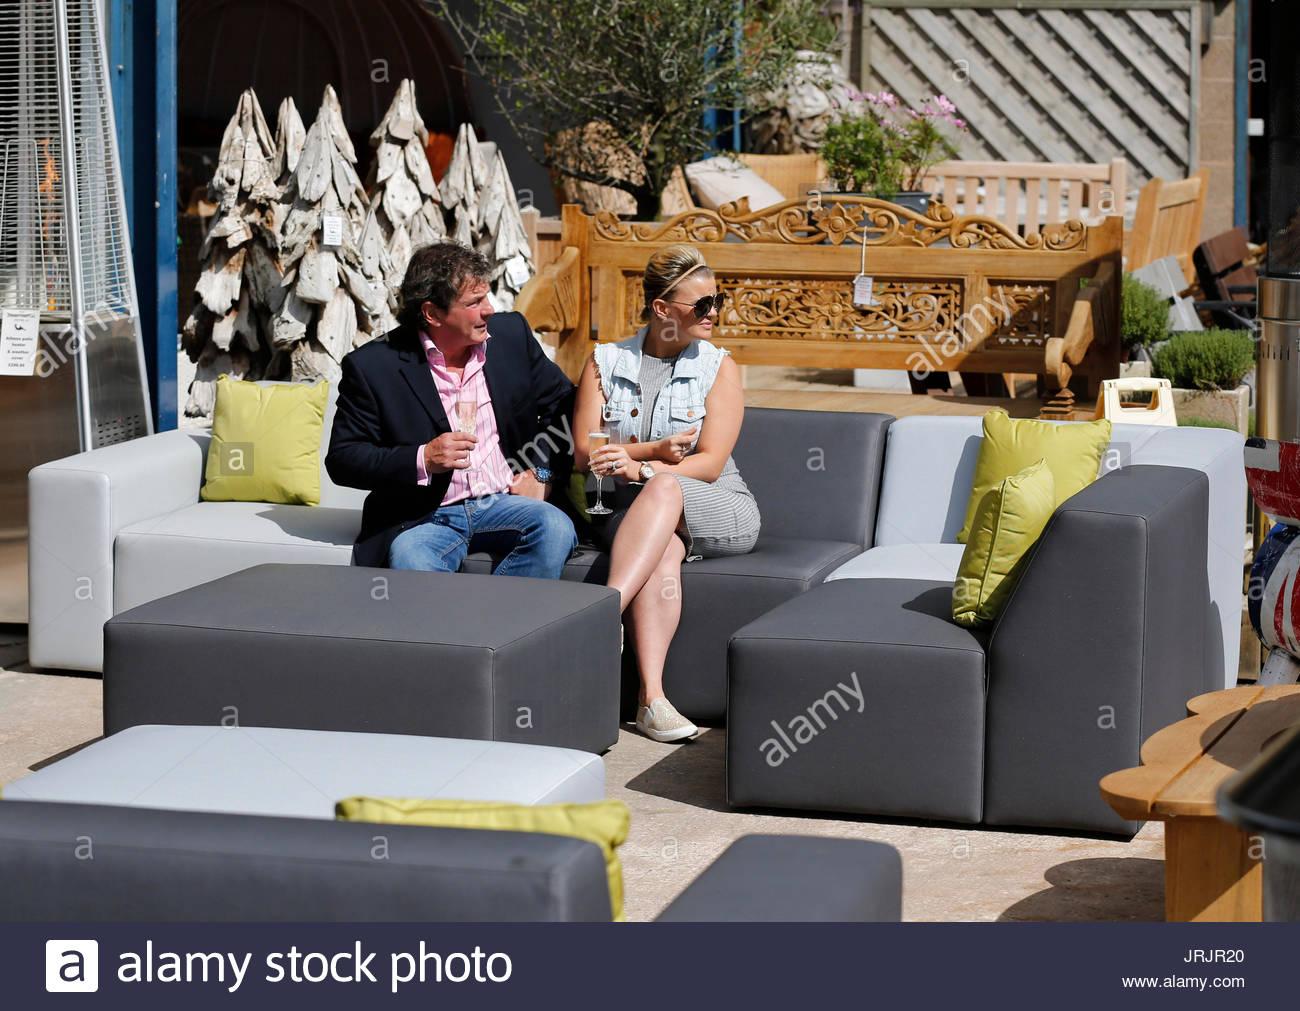 Ordinaire Kerry Katona. Kerry Katona Visits Garden Furniture Centre At Yew Tree Farm  Craft Centre In Wootton Wawen